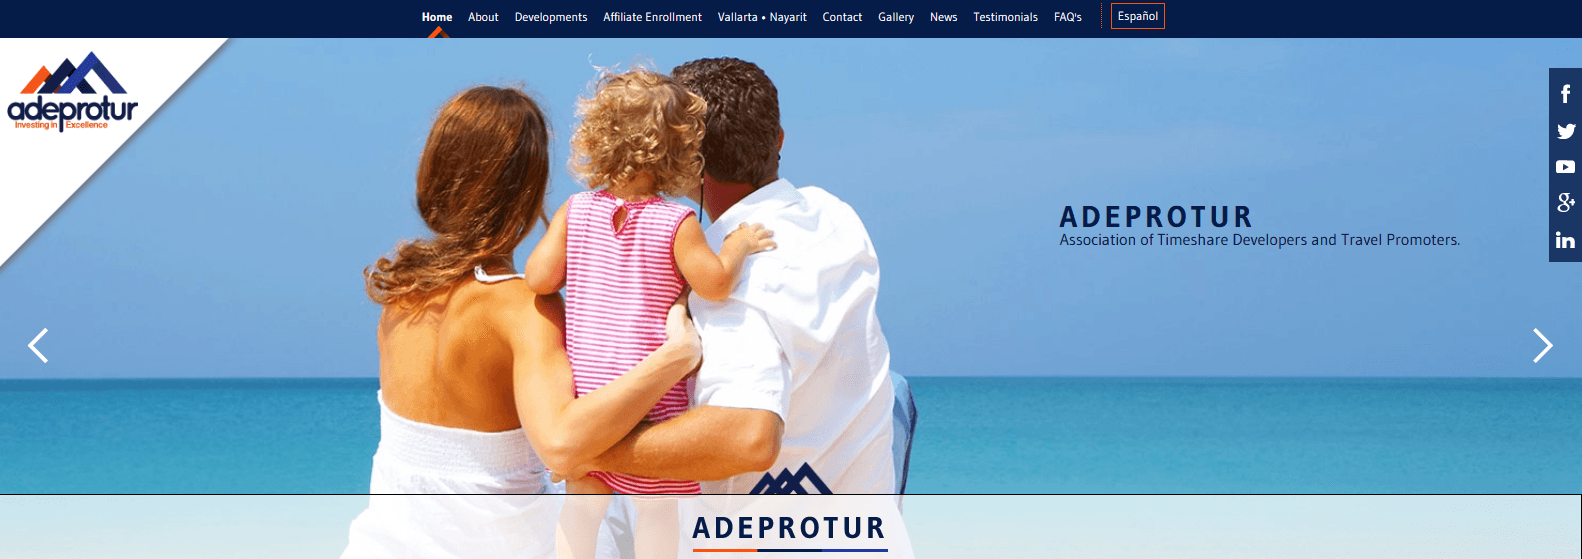 adeprotur and Villa del palmar timeshare